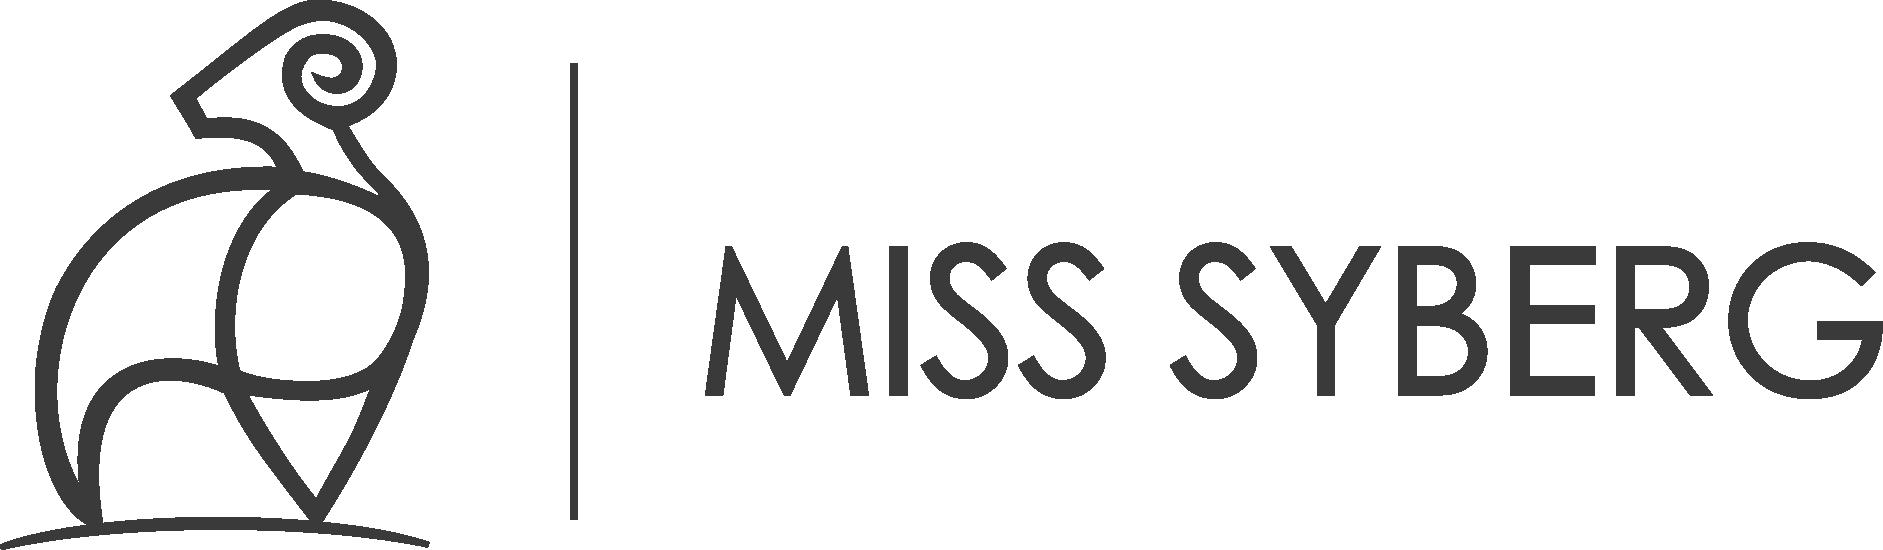 Misssyberg.dk